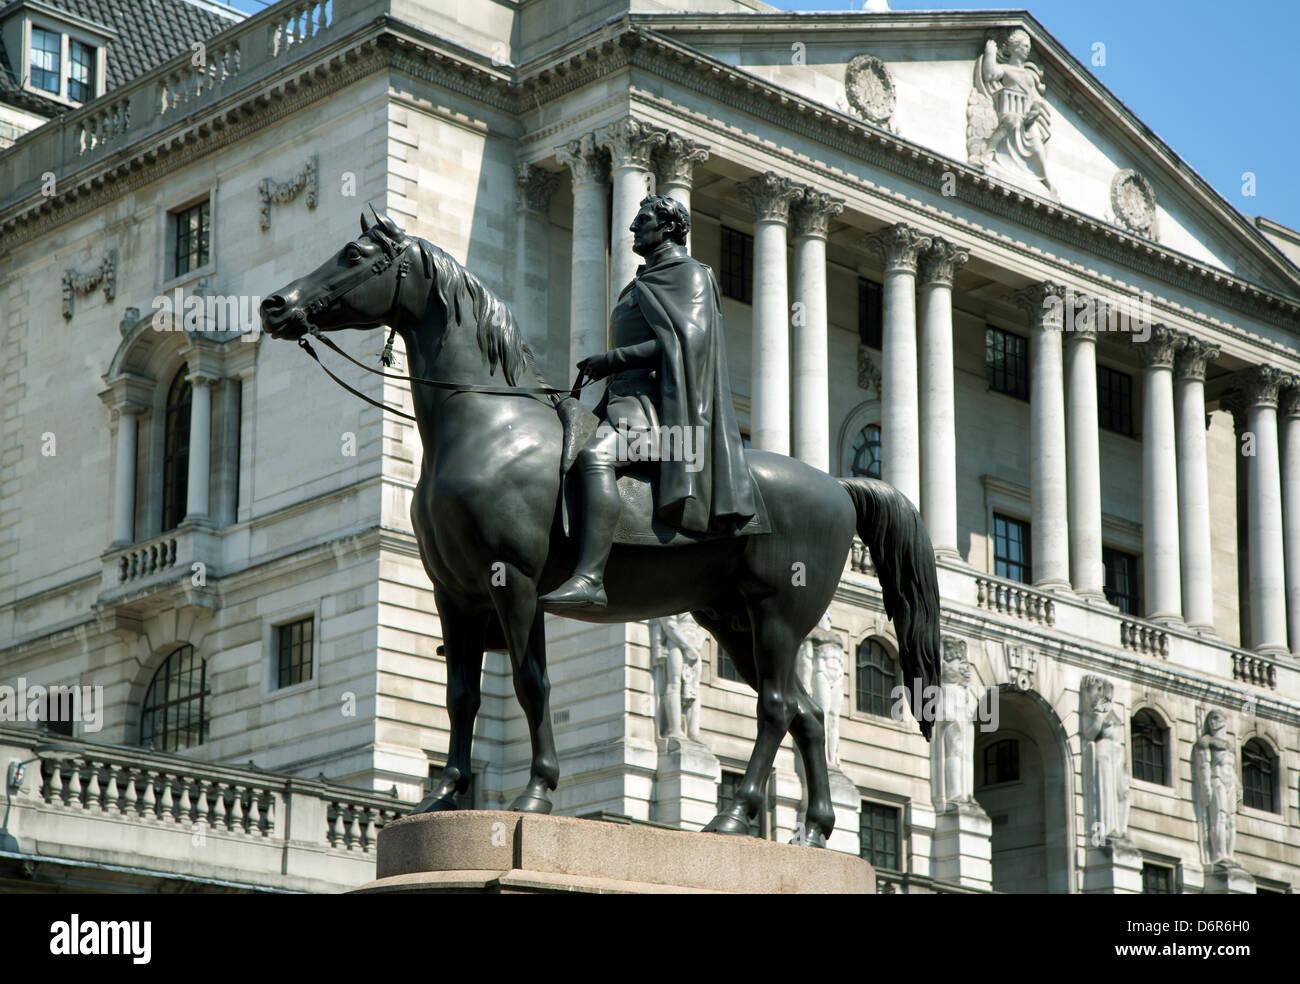 London, United Kingdom, equestrian statue of the Duke of Wellington - Stock Image